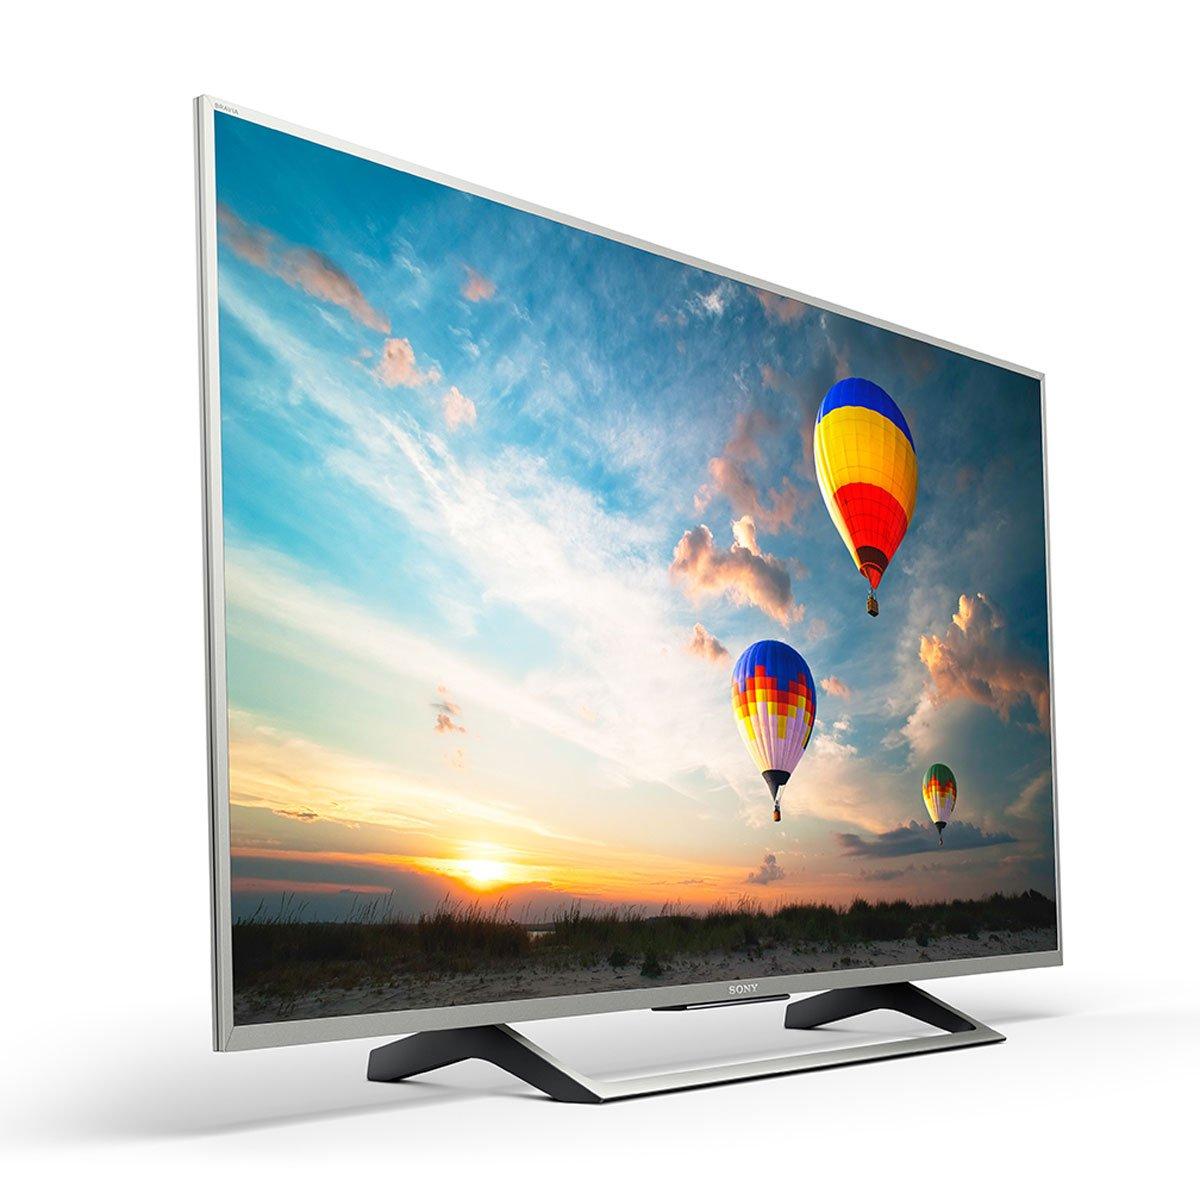 Pantalla 55 led ultra 4k hdr android tv sony mod 55x800e for Mesa tv 49 pulgadas